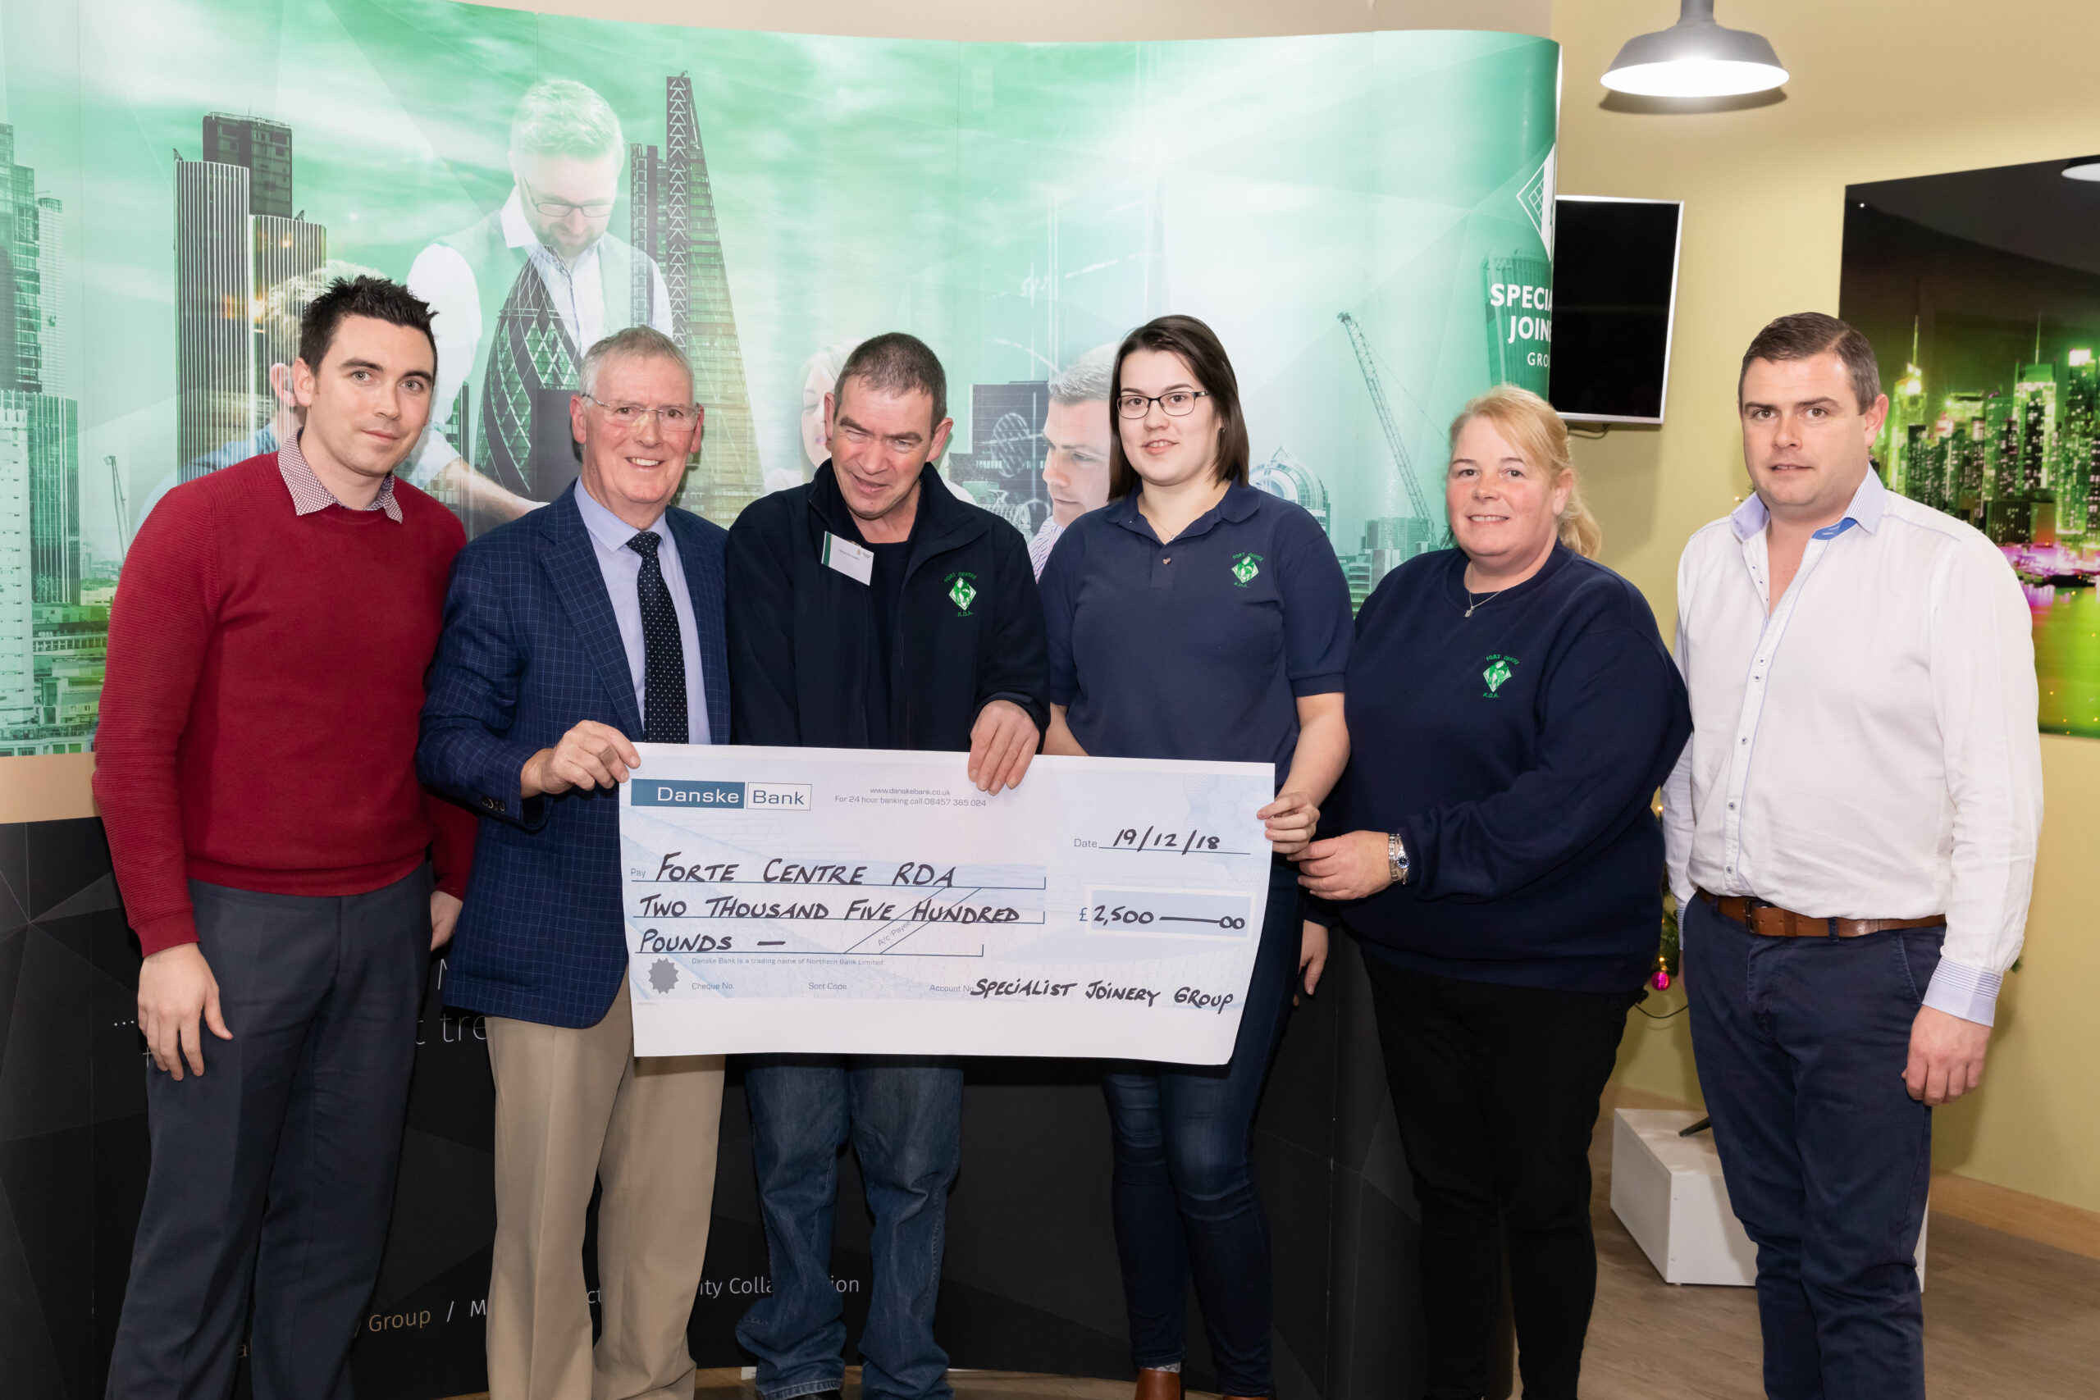 Dermot, John Bosco and Ciaran O'Hagan presenting donation to The Fort Centre RDA